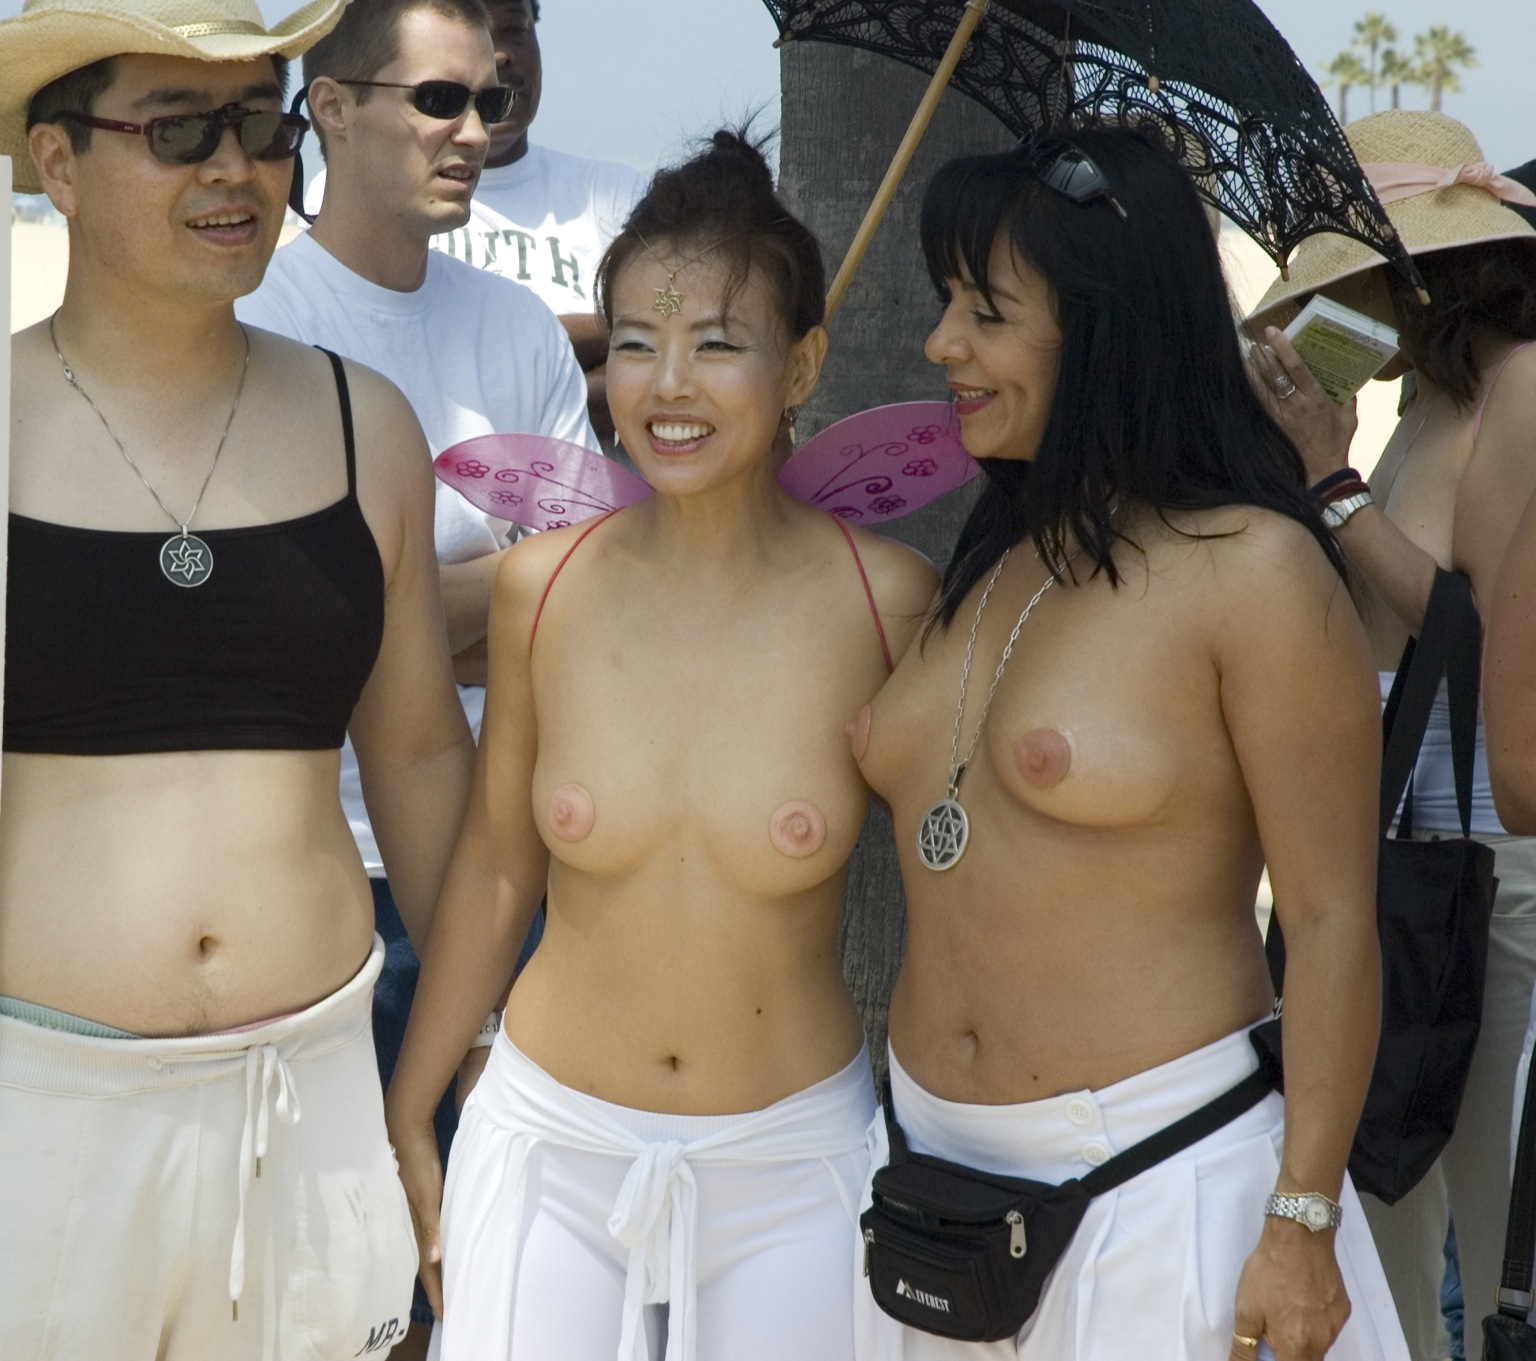 Clinton ass topless girls in bibs rhino cock